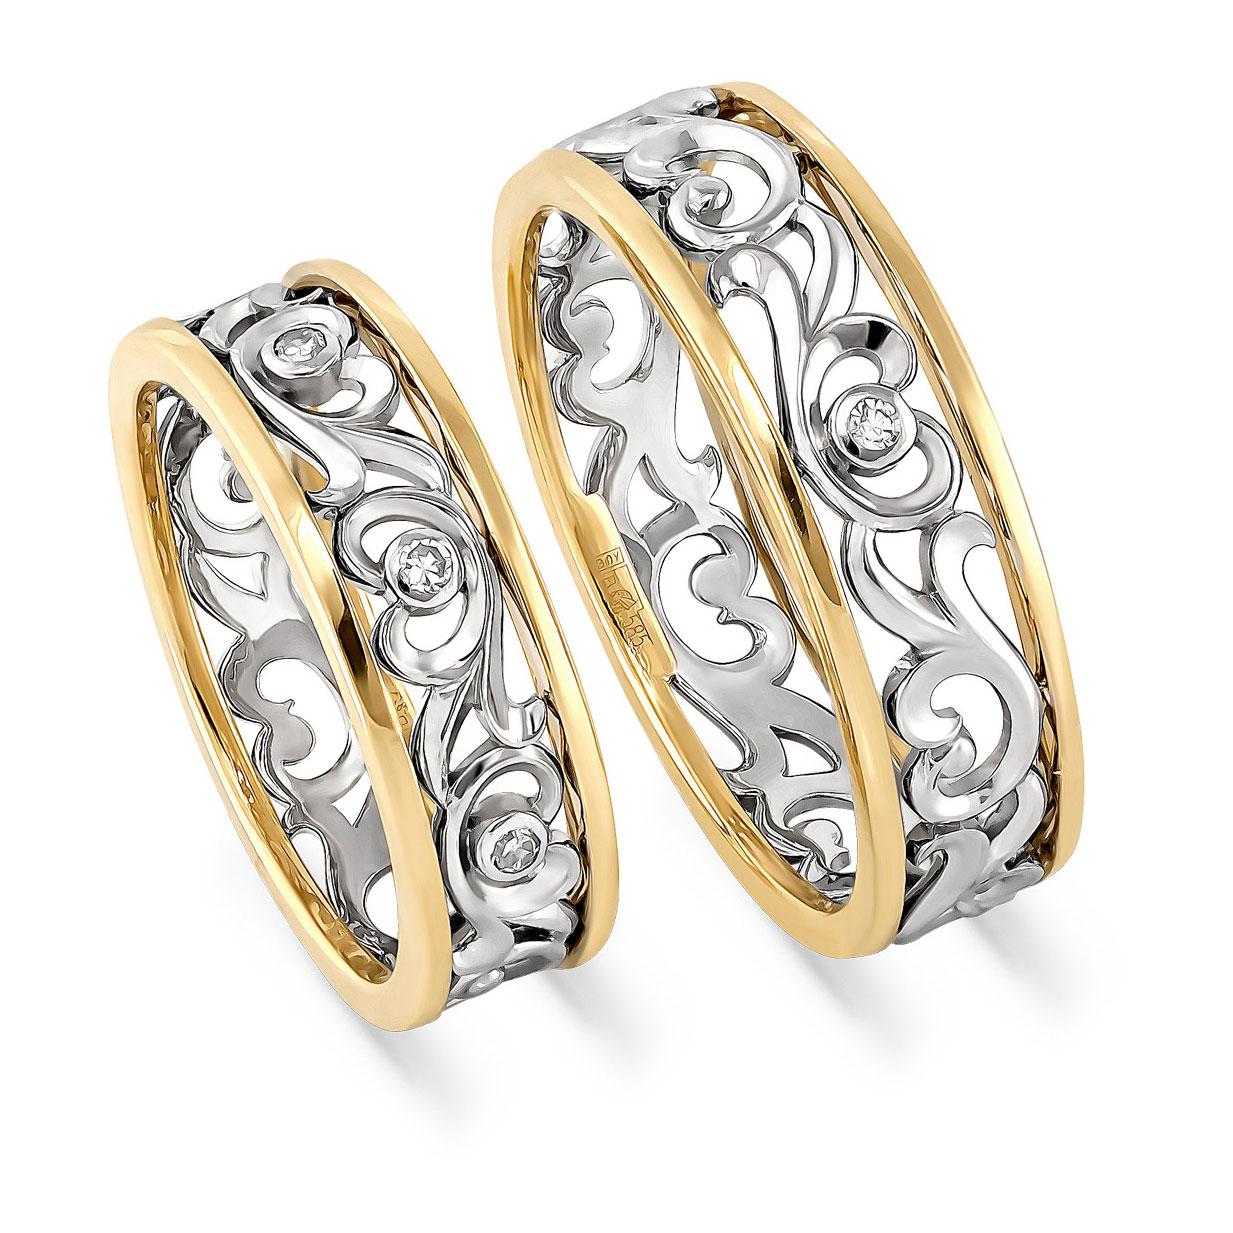 Кольцо из лимонного золота Бриллиант арт. 1-2318-1000 1-2318-1000